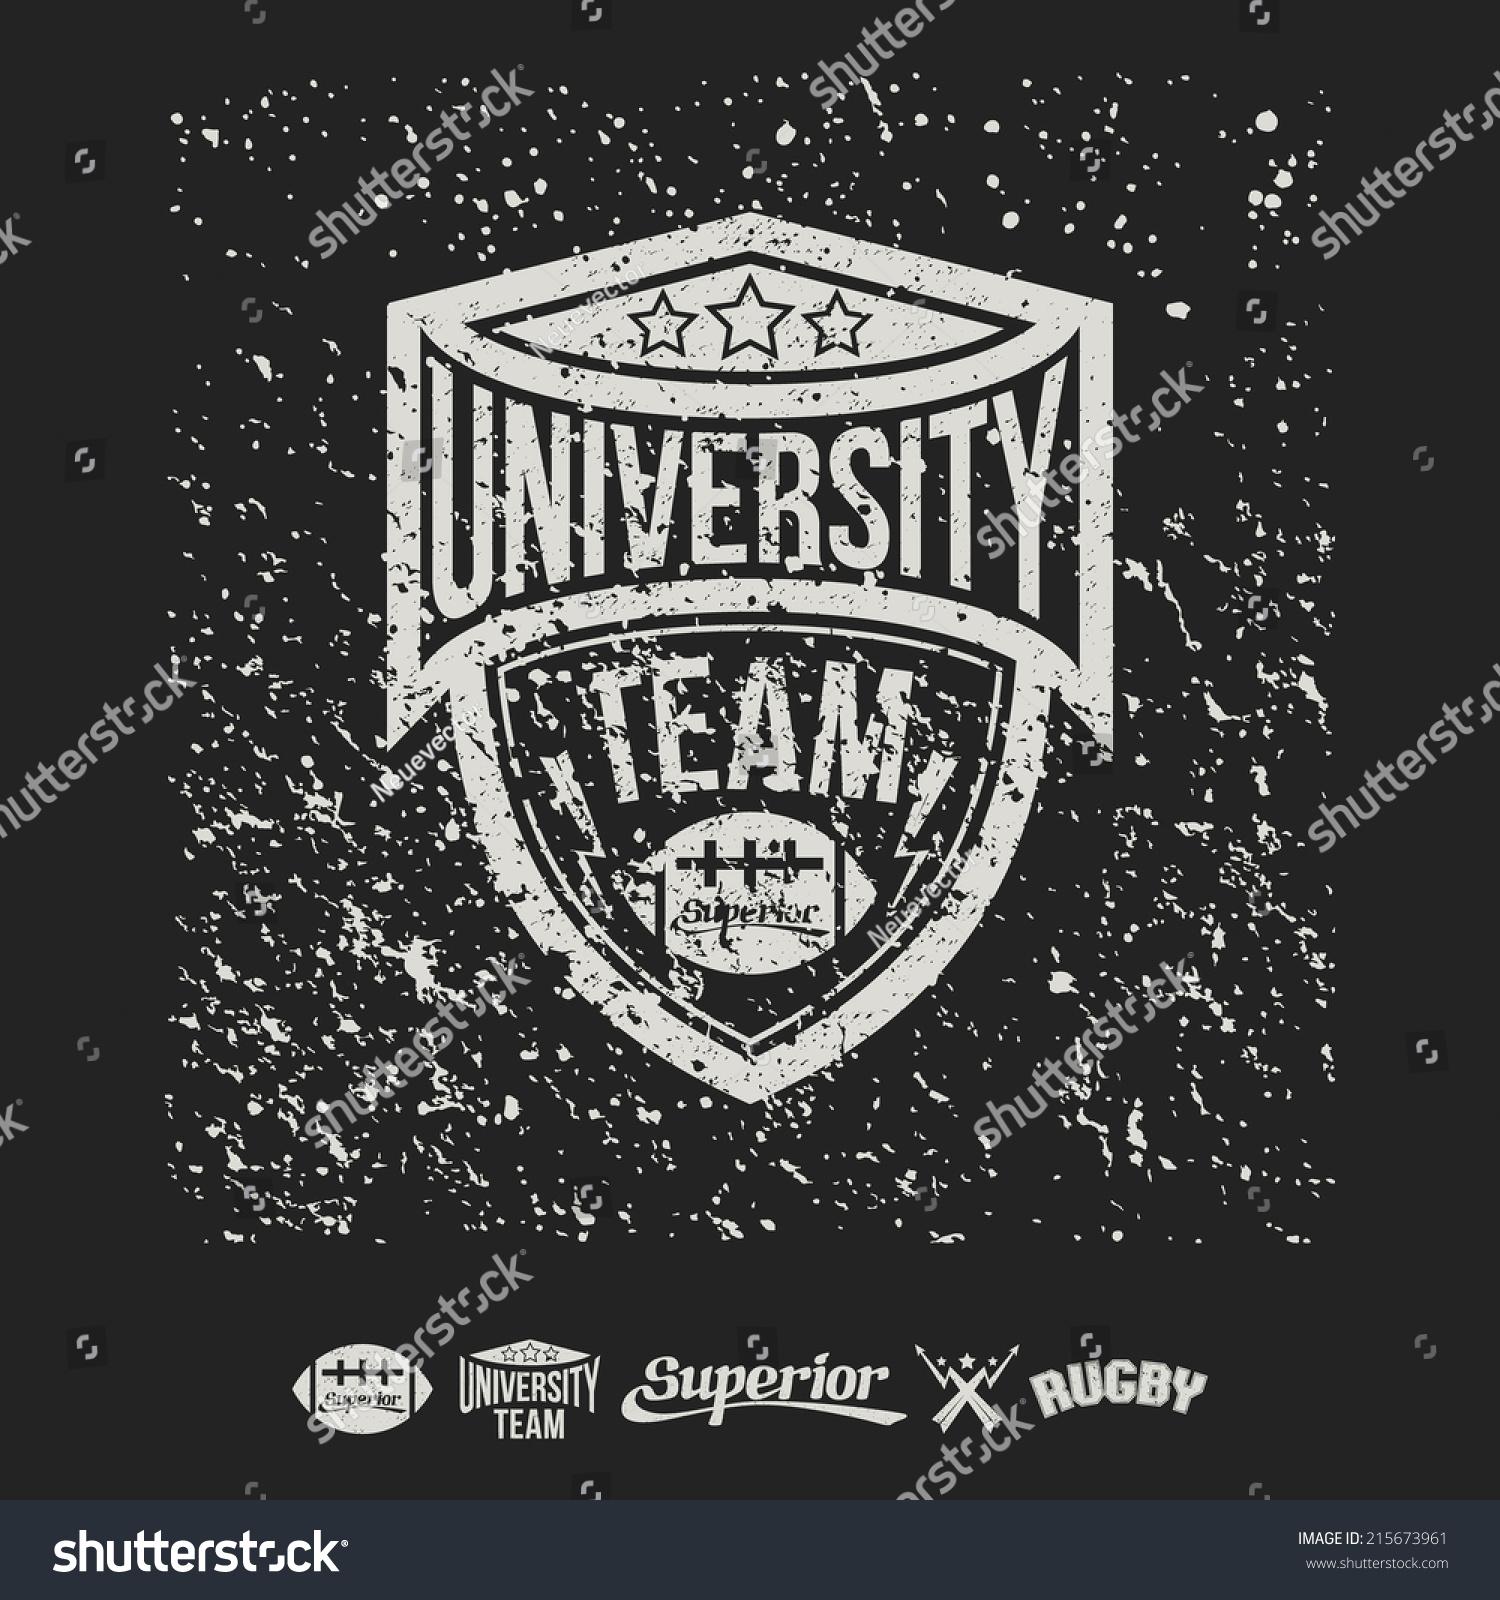 Design t shirt rugby - Rugby Emblem University Team And Design Elements Graphic Design For T Shirt On Black